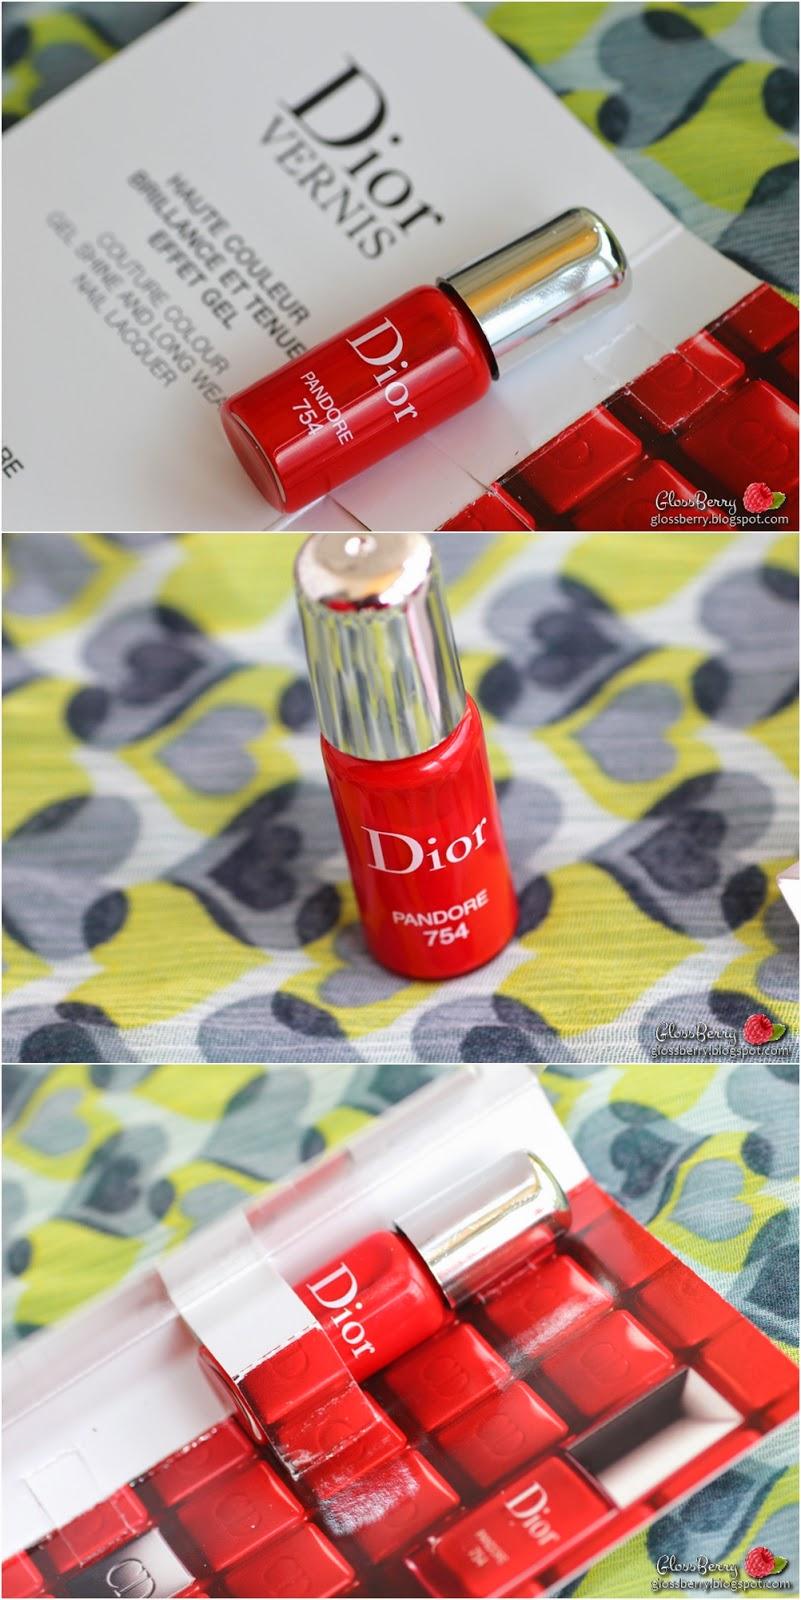 dior mini pandore 754 לק דיור אדום